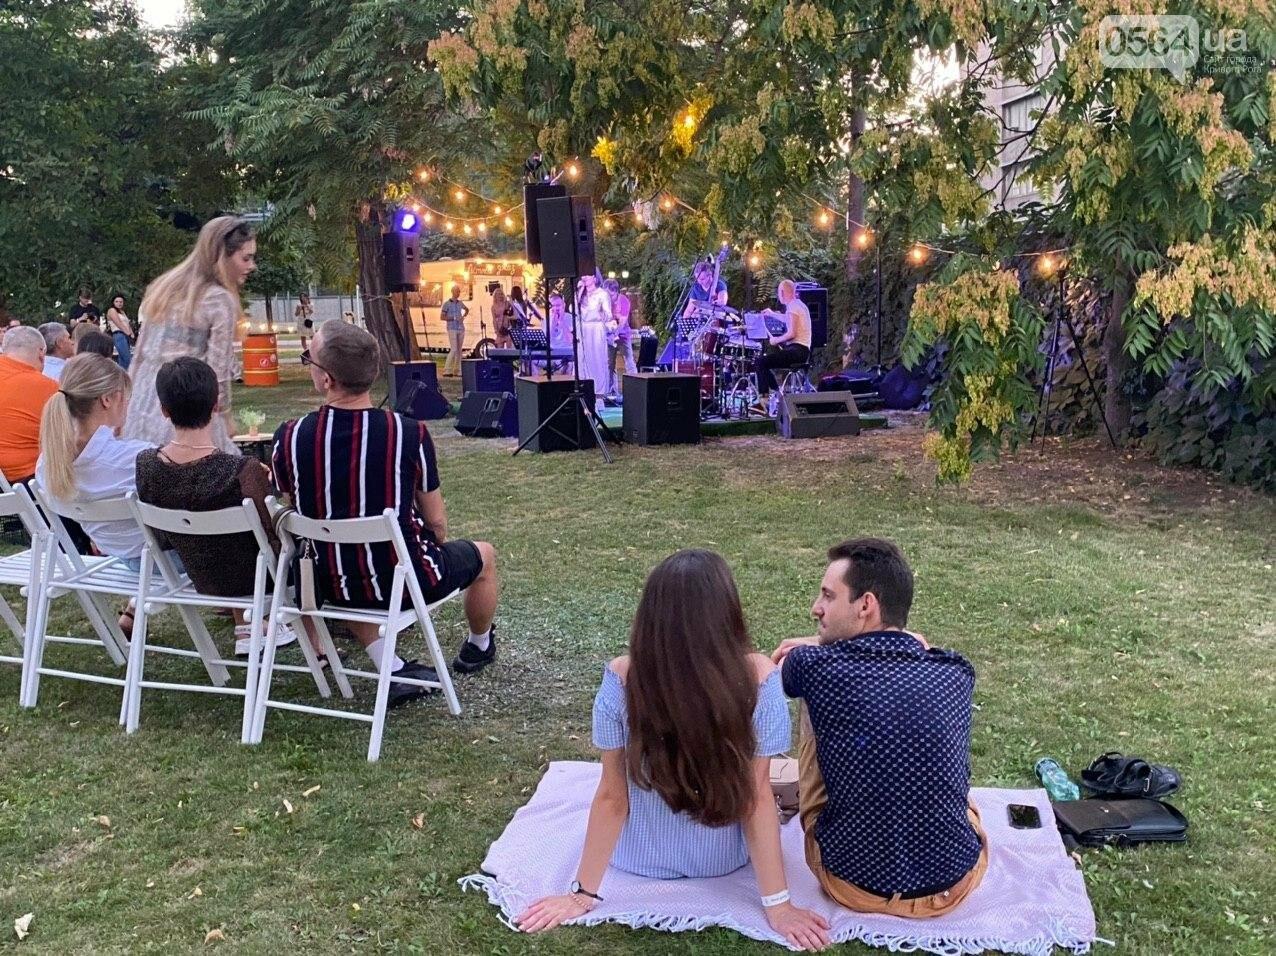 Под звездным небом криворожане наслаждались летним джазом от  Advantage Project, - ФОТО, ВИДЕО , фото-33